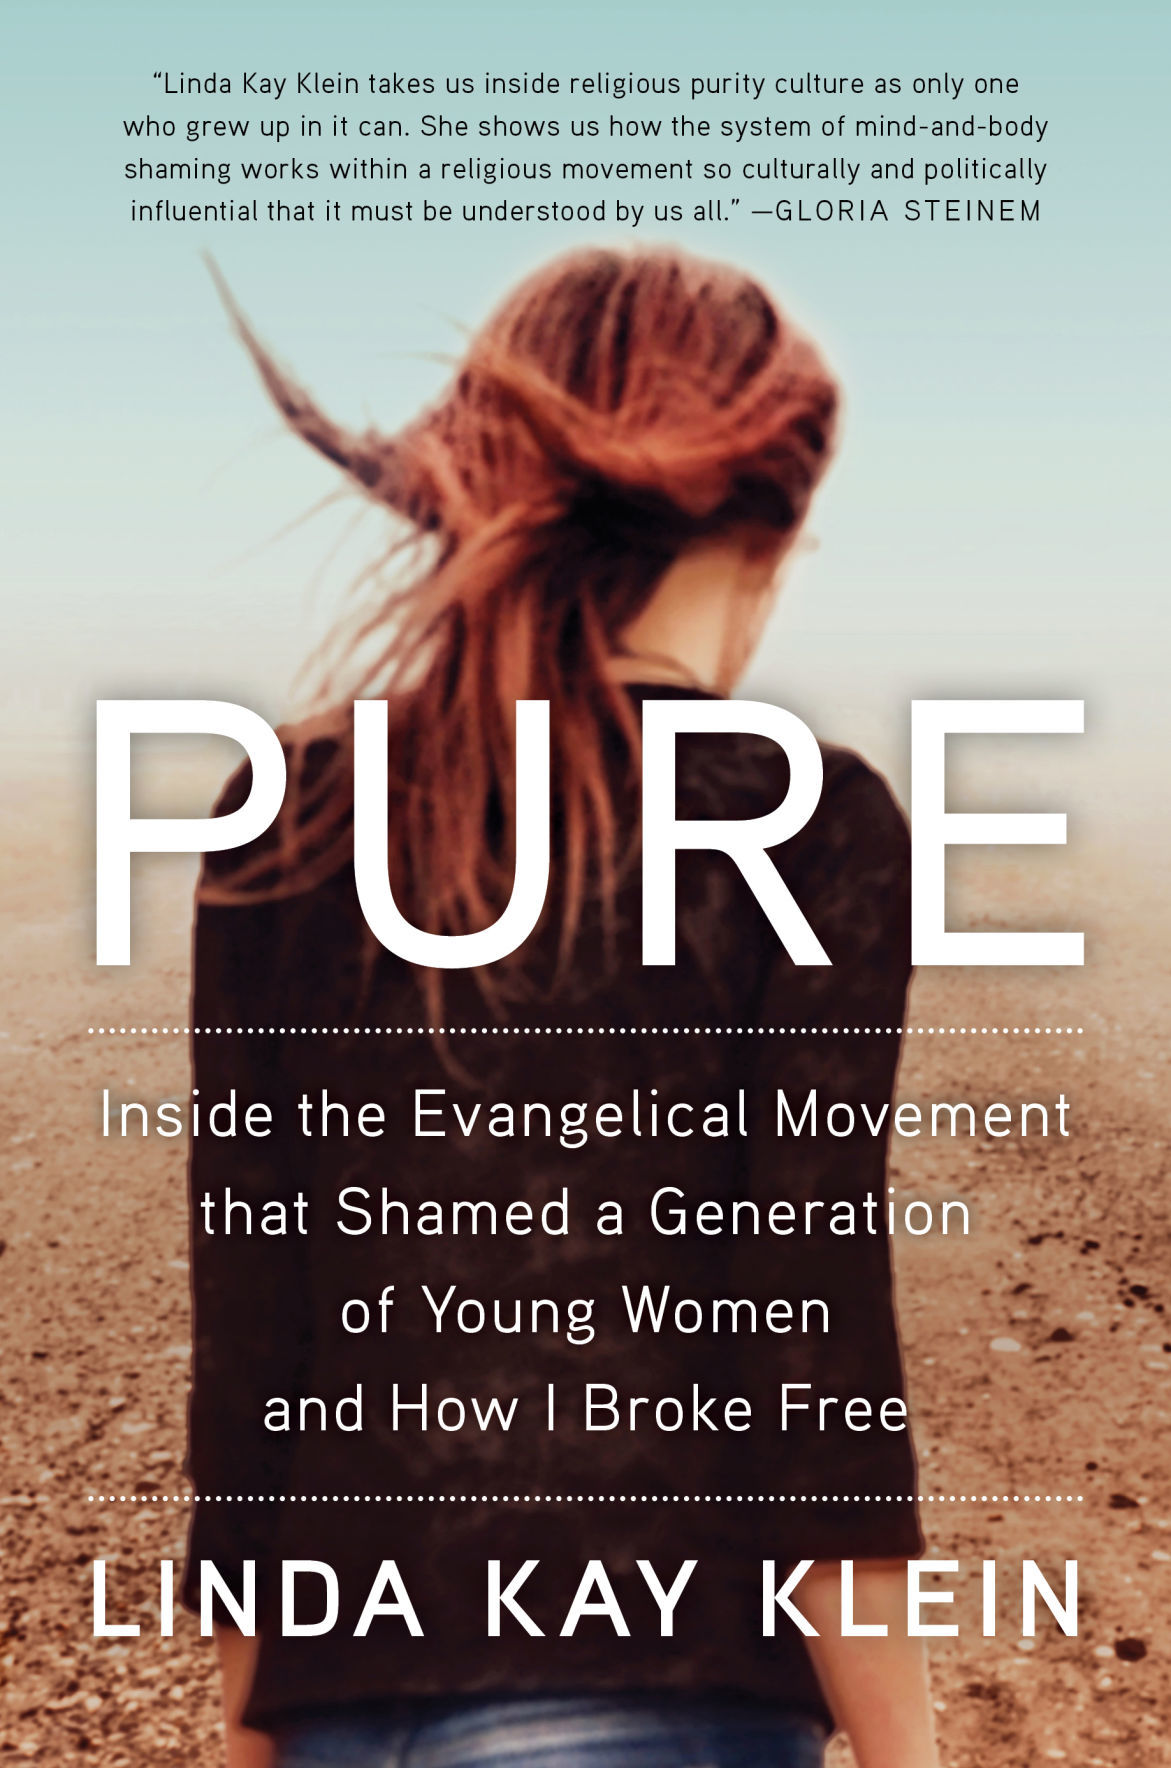 'Pure' by LInda Kay Klein